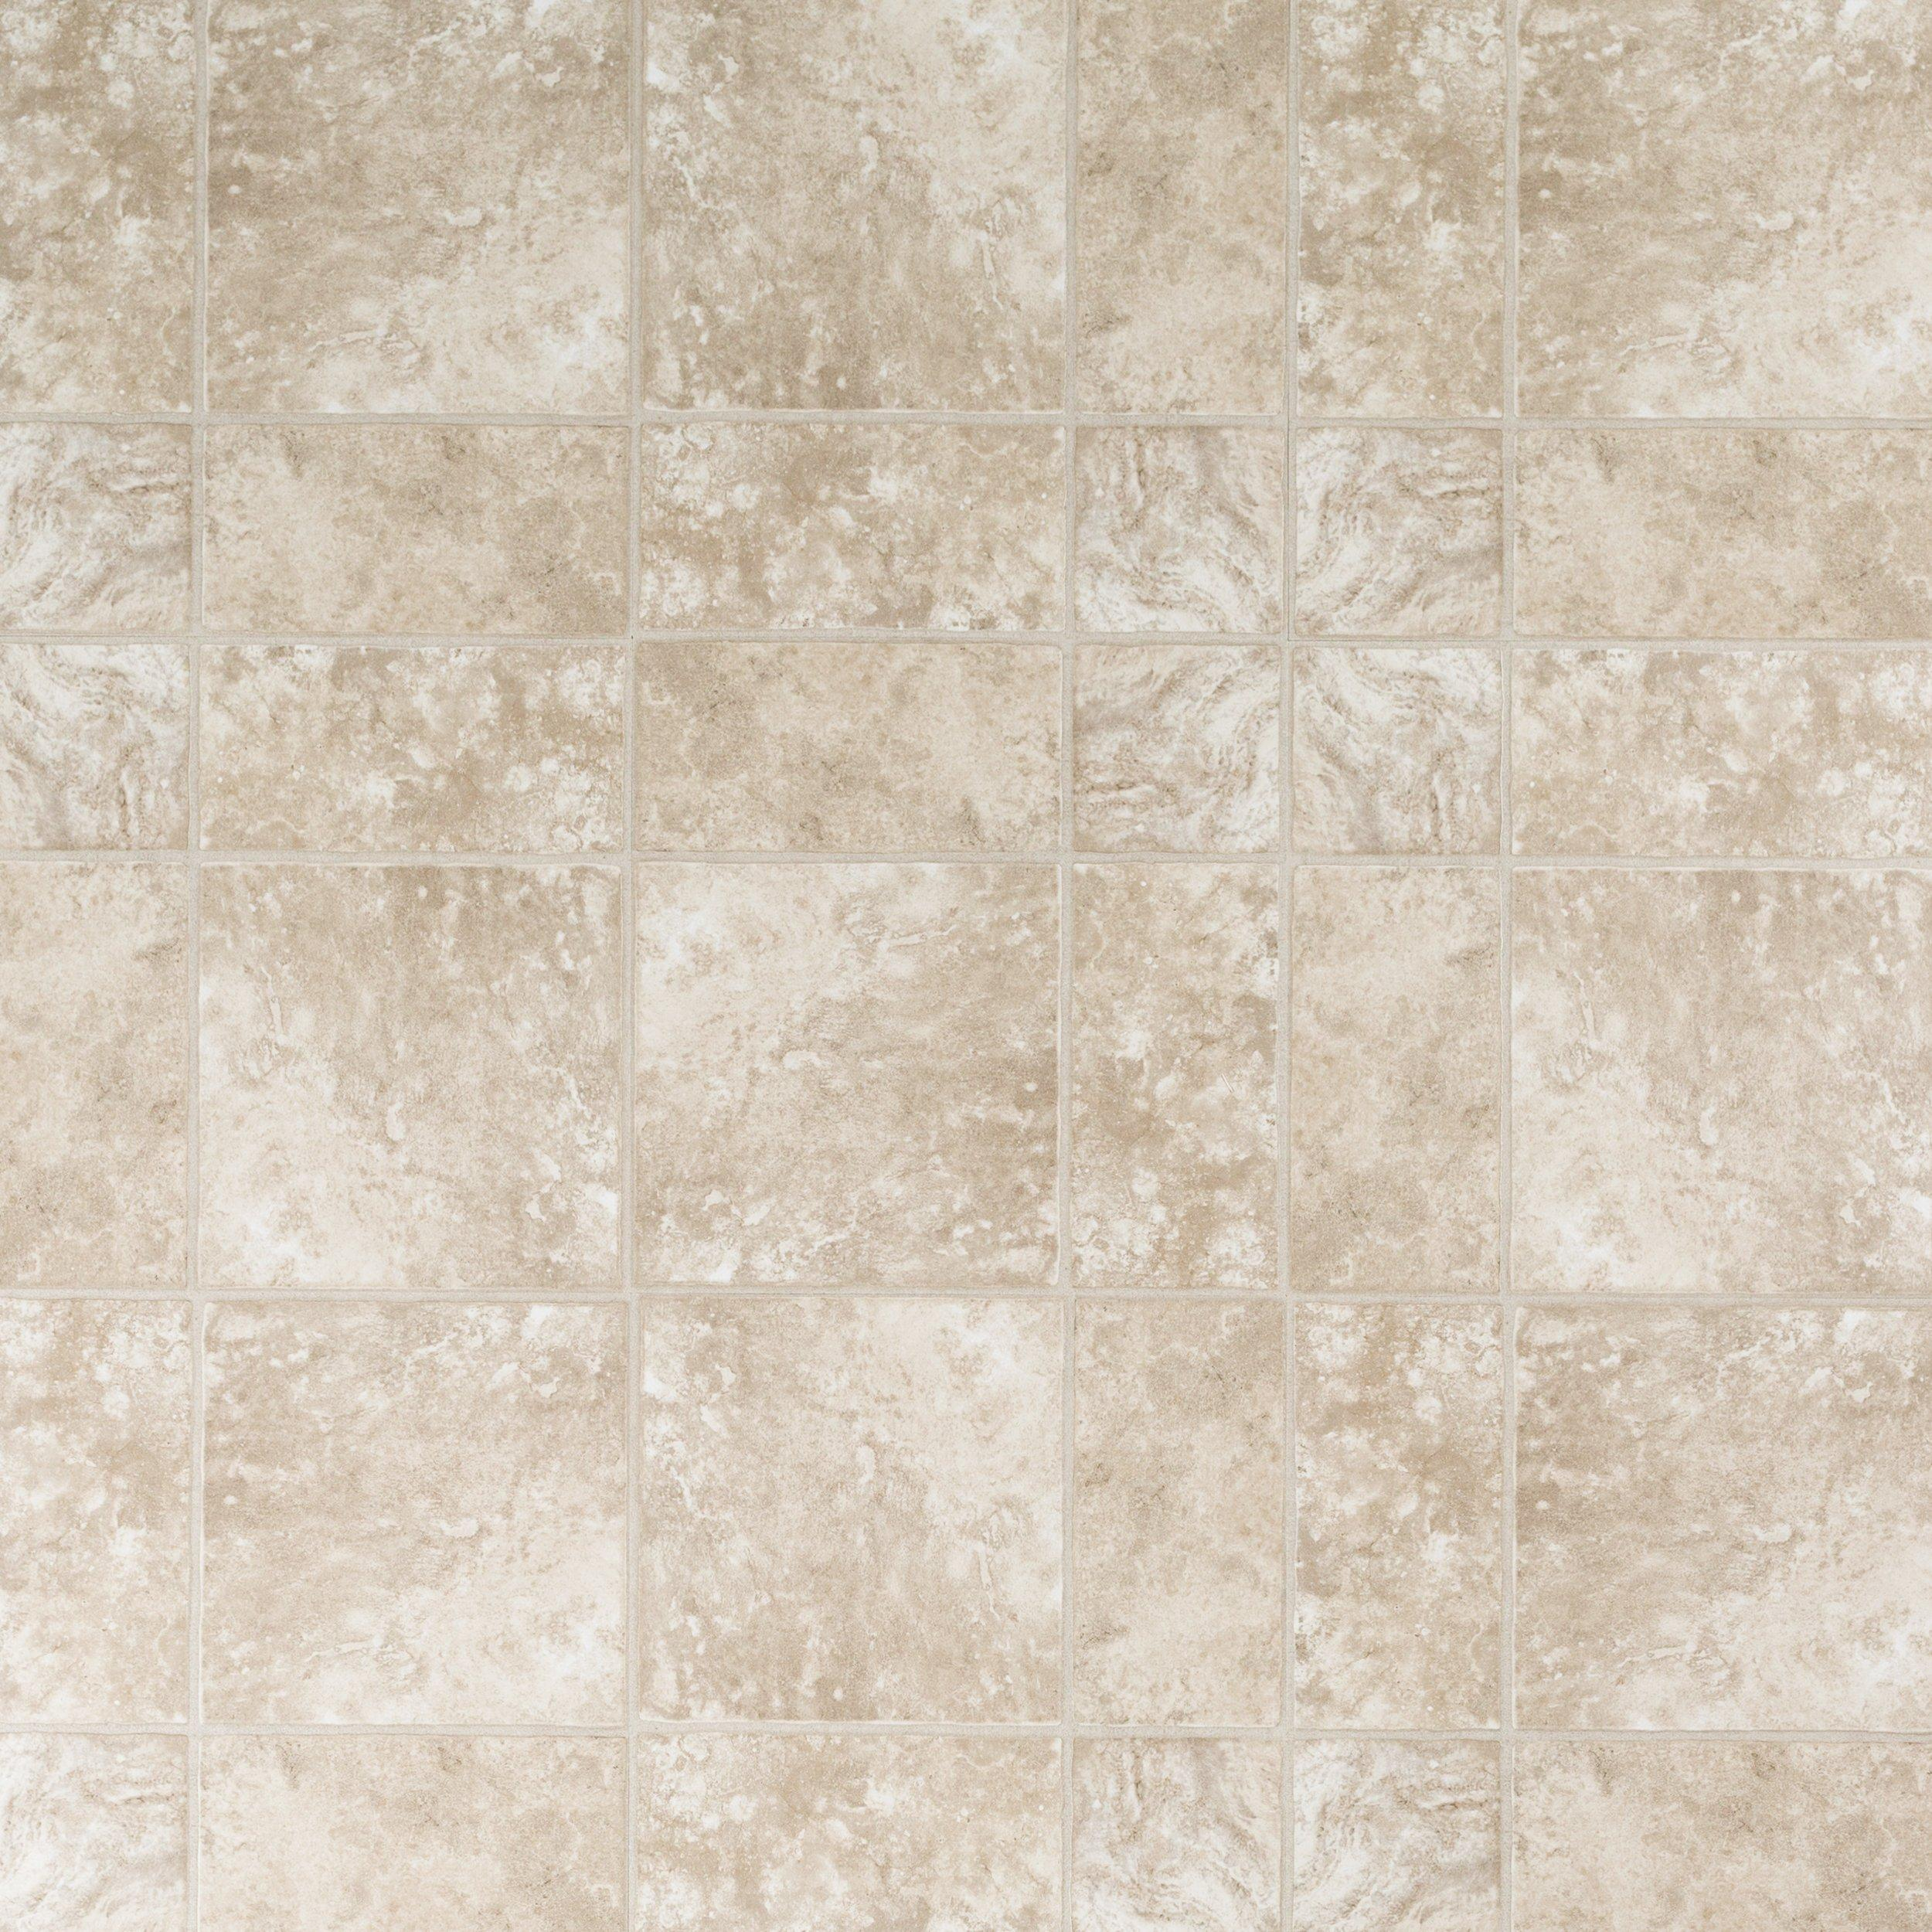 travertine paver luxury vinyl tile